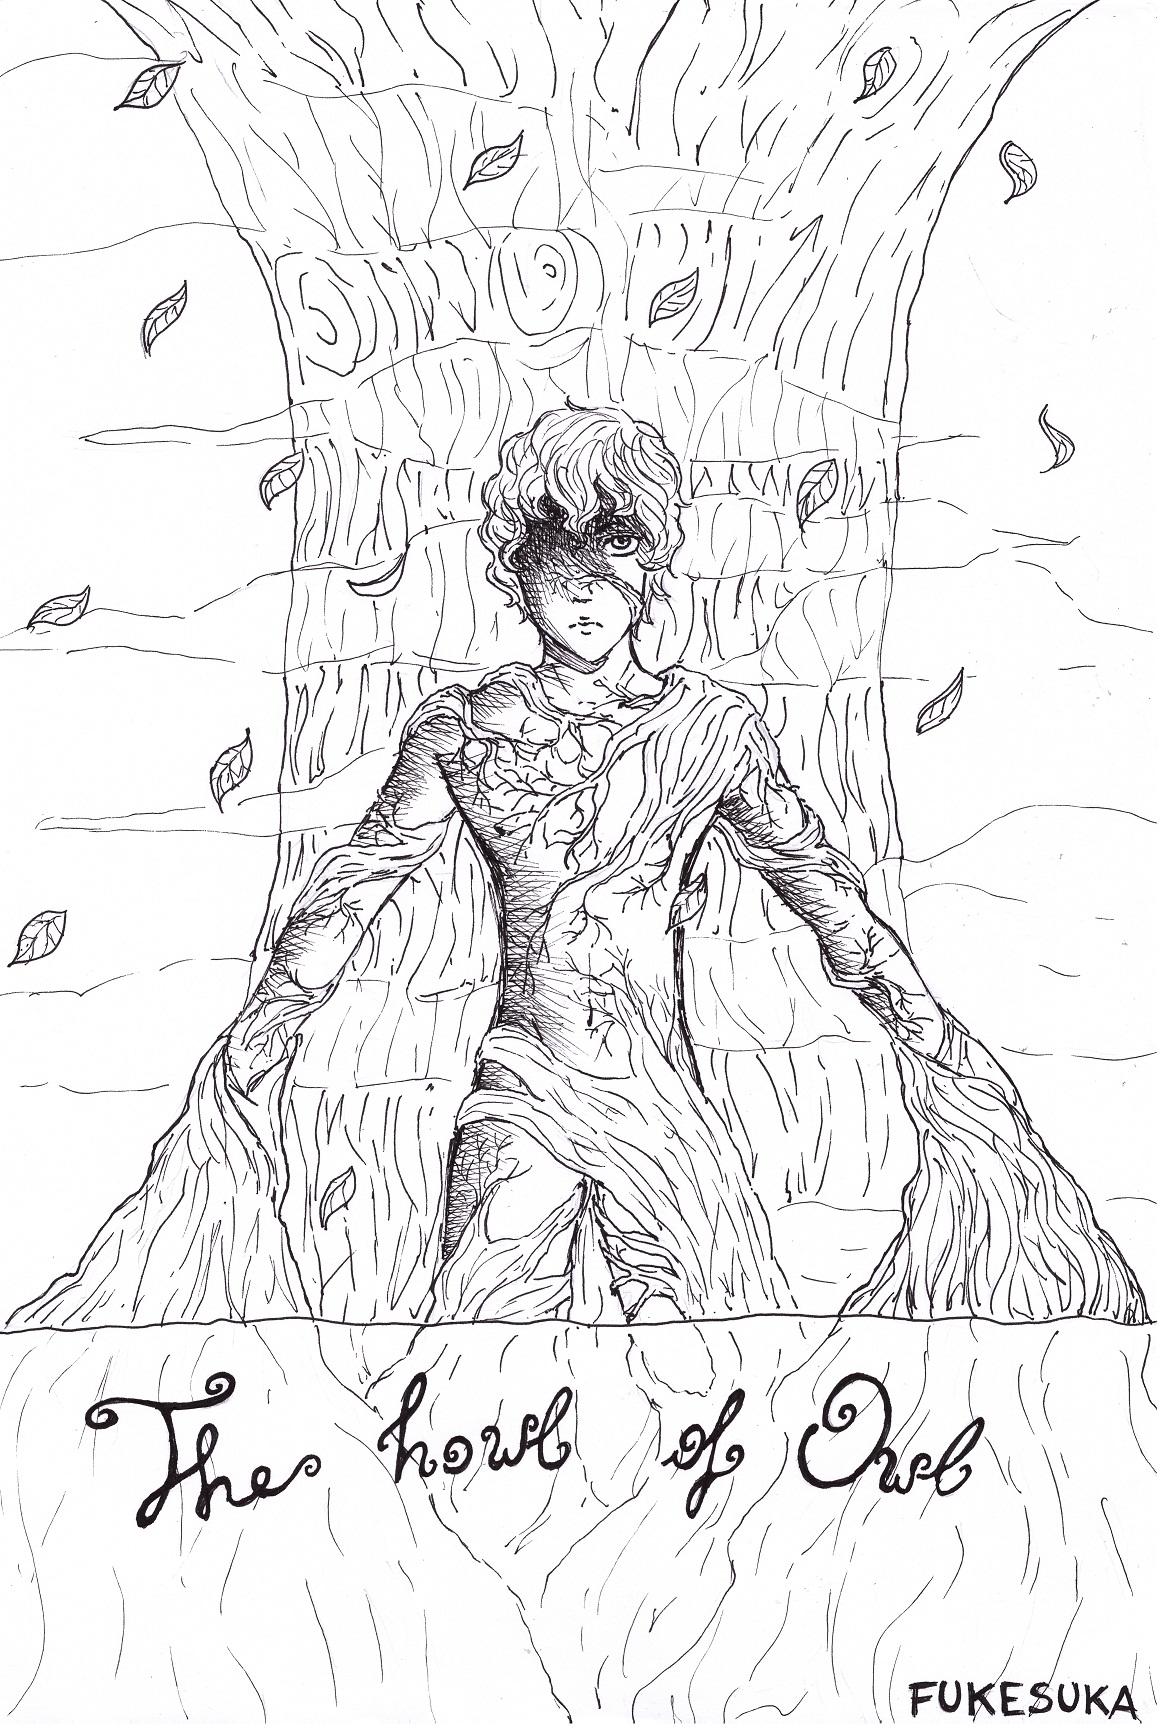 Komixjam Manga Project Gennaio I Lavori In Concorso